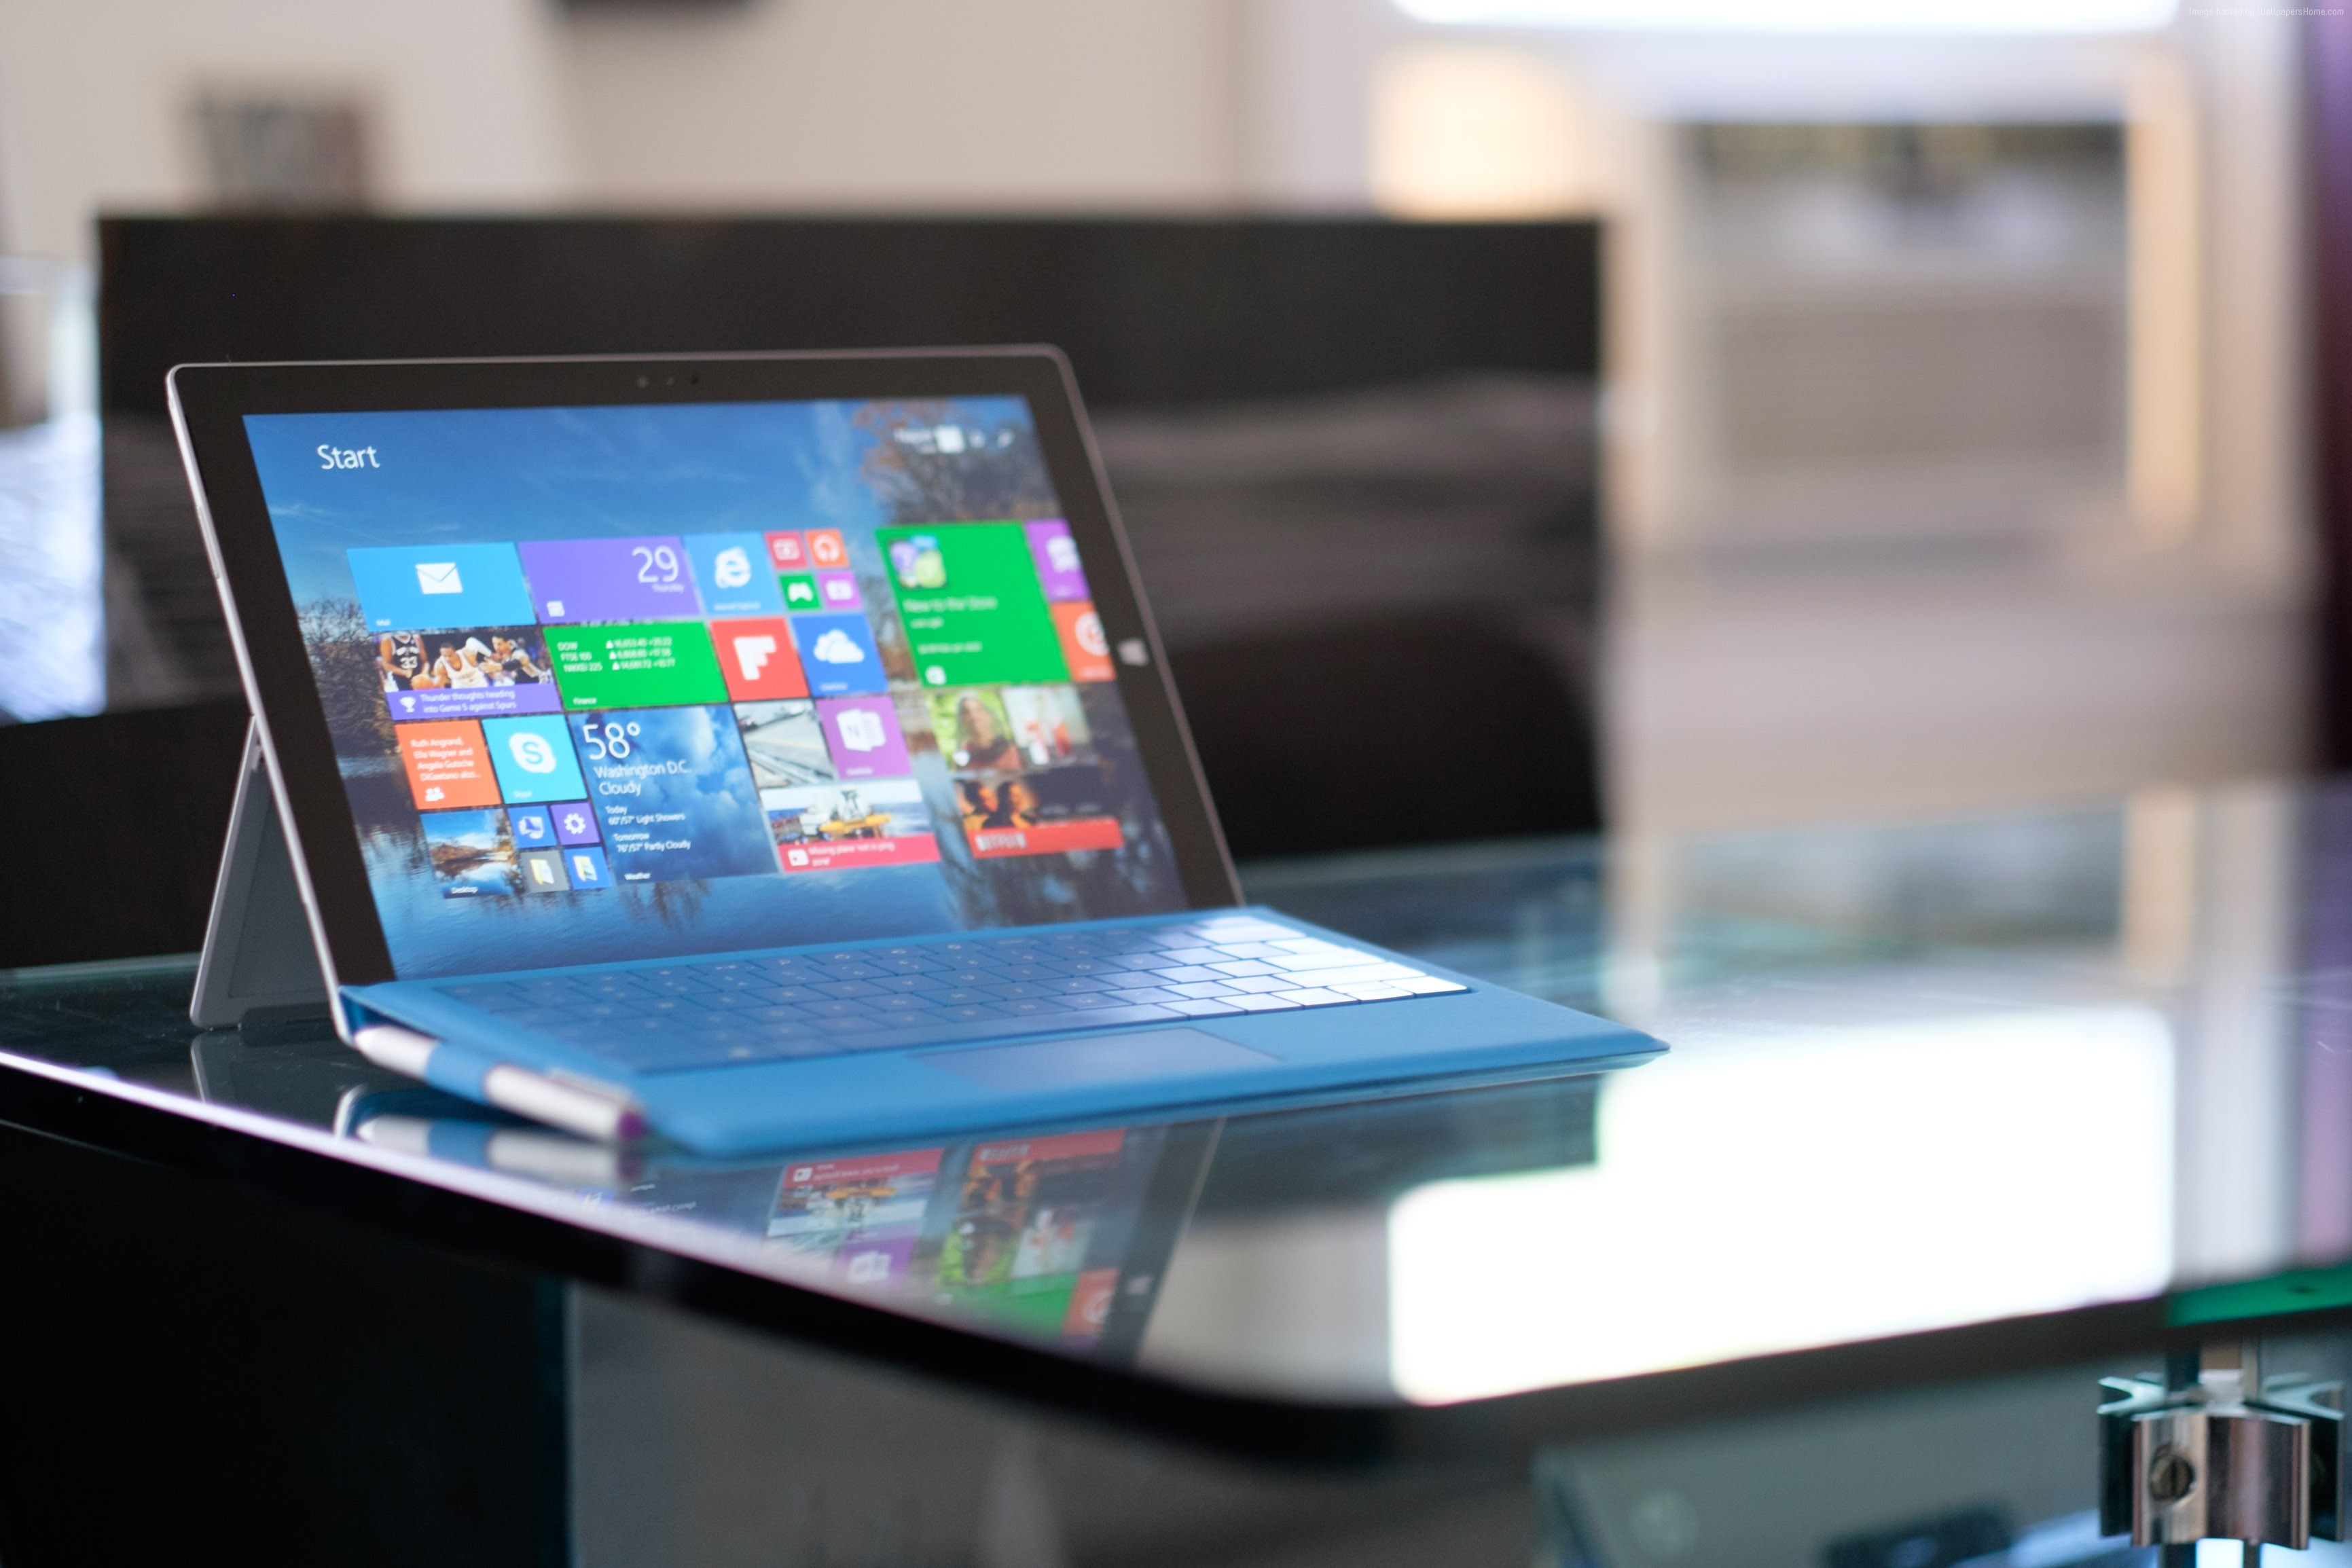 Surface Pro 4 Wallpaper, Hi-Tech / Tablets: Microsoft Surface Pro 4 ...